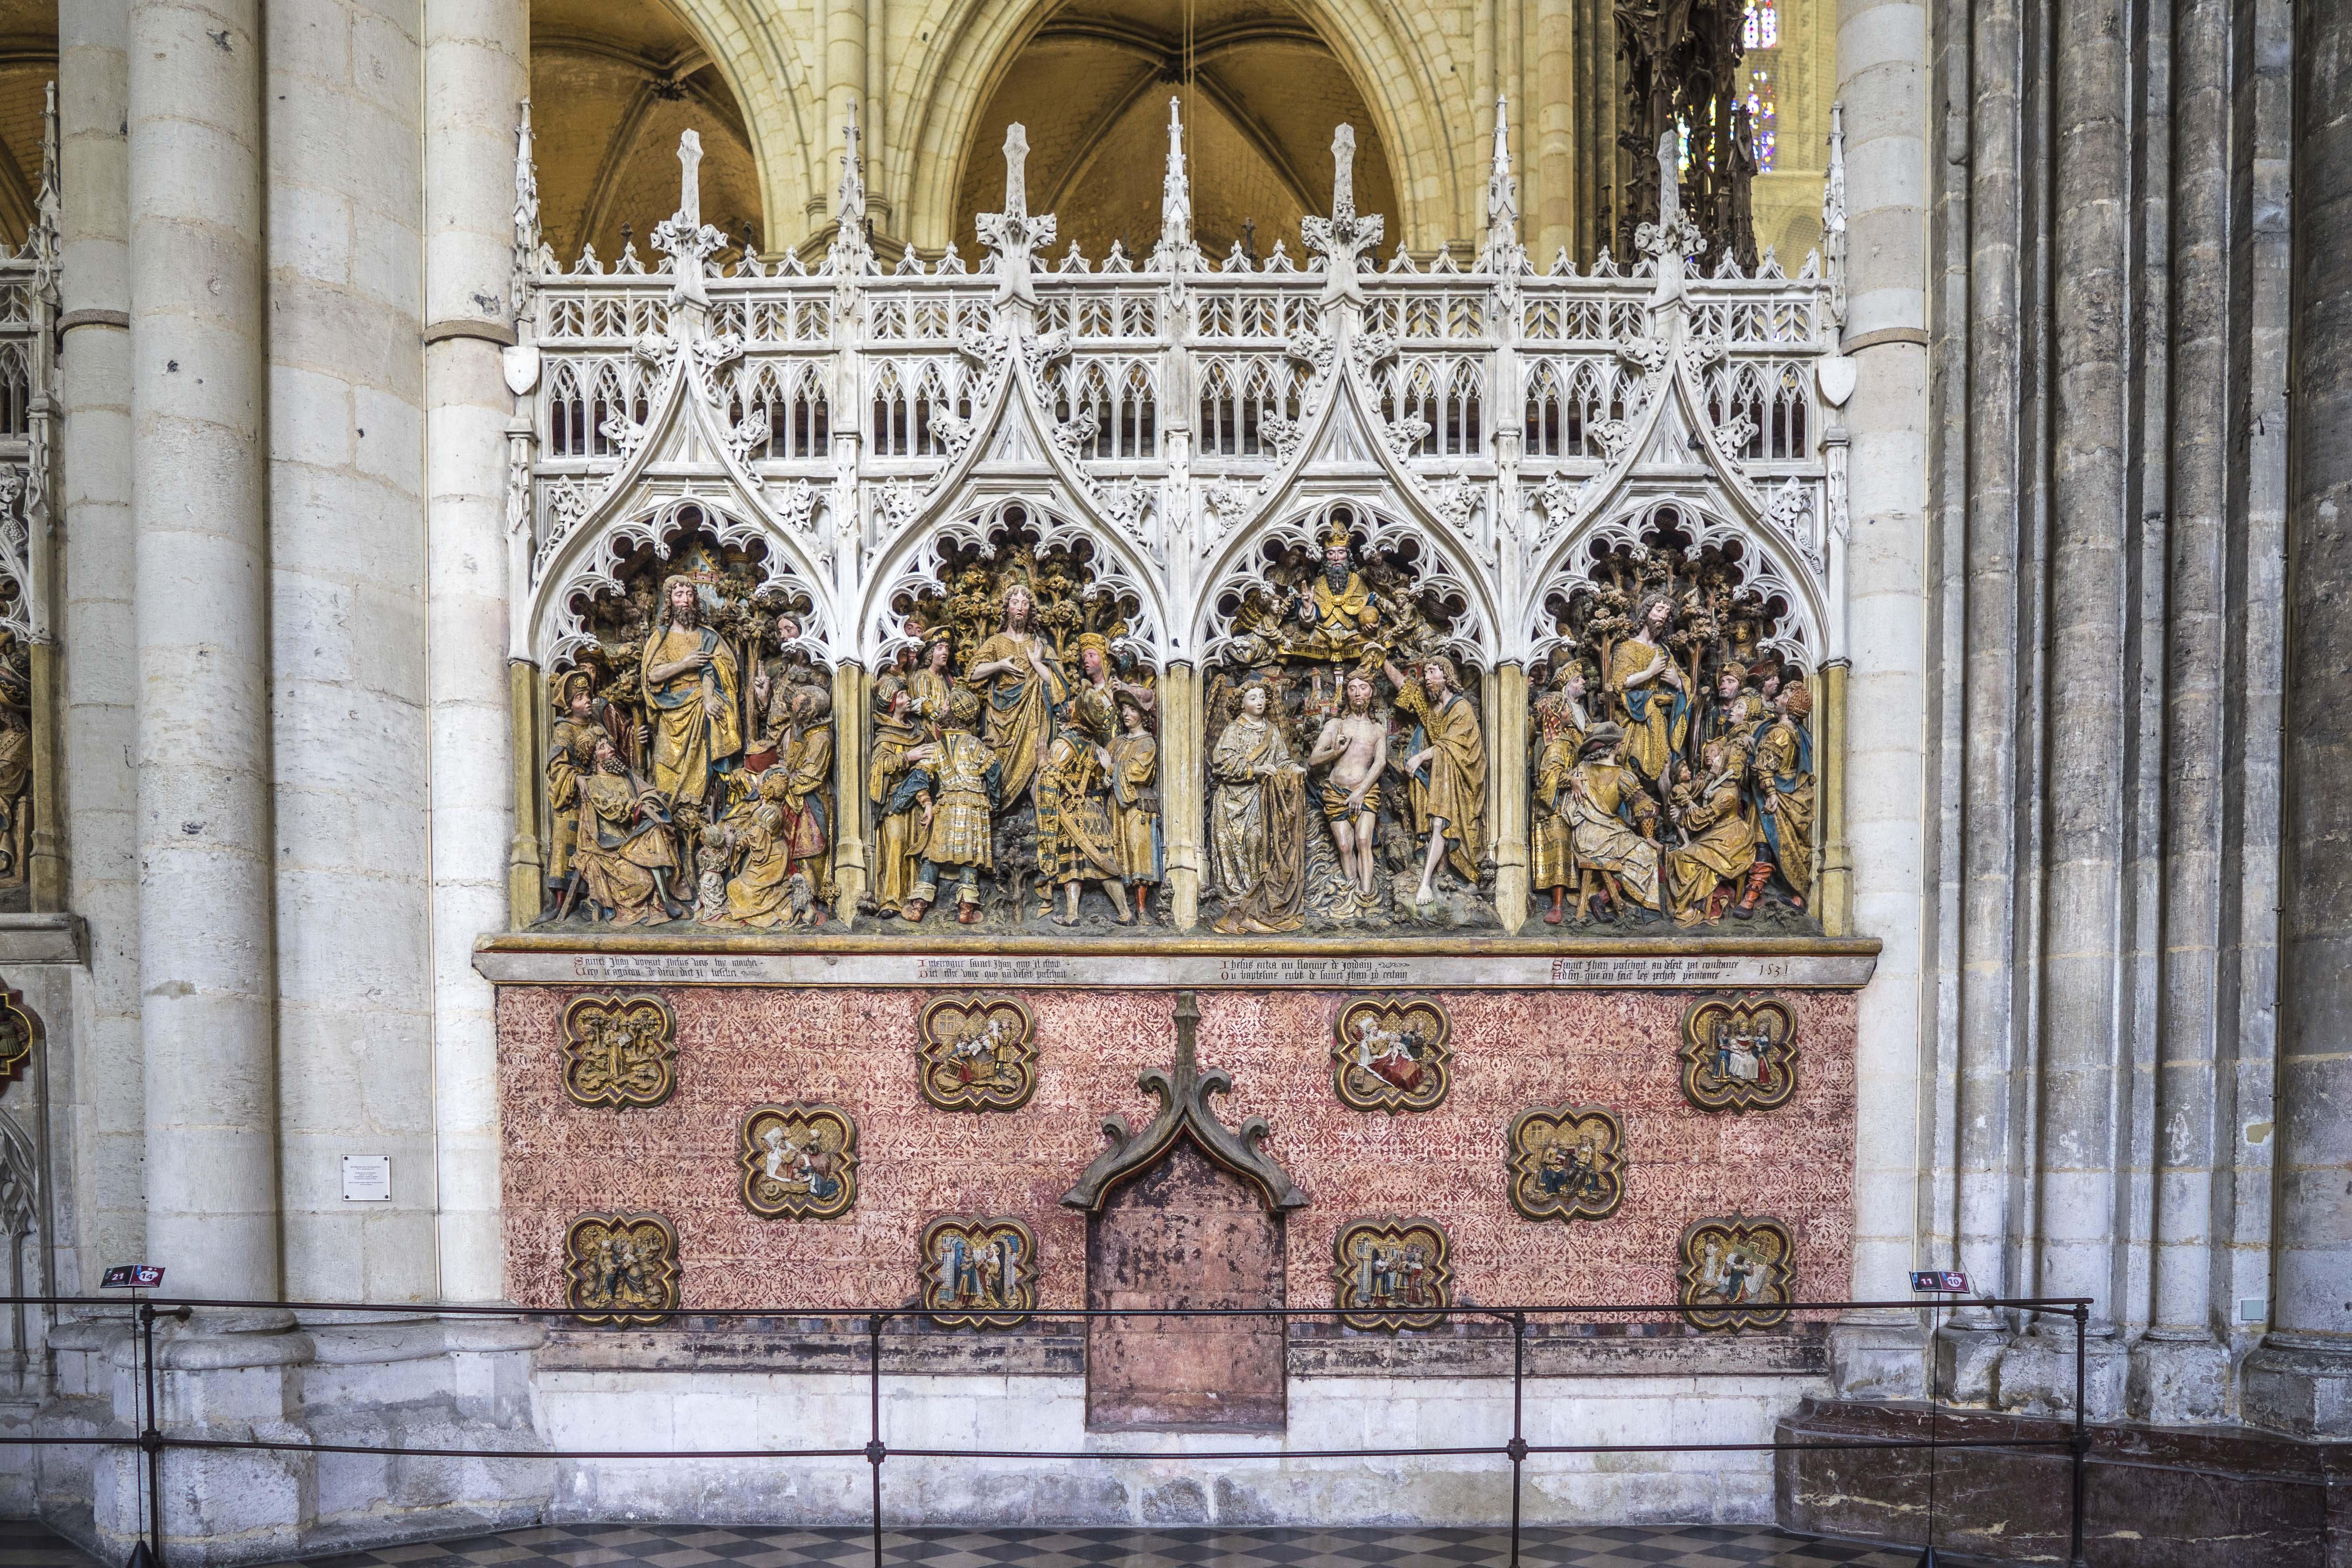 Amiens, France - Chancel Screen, second pane